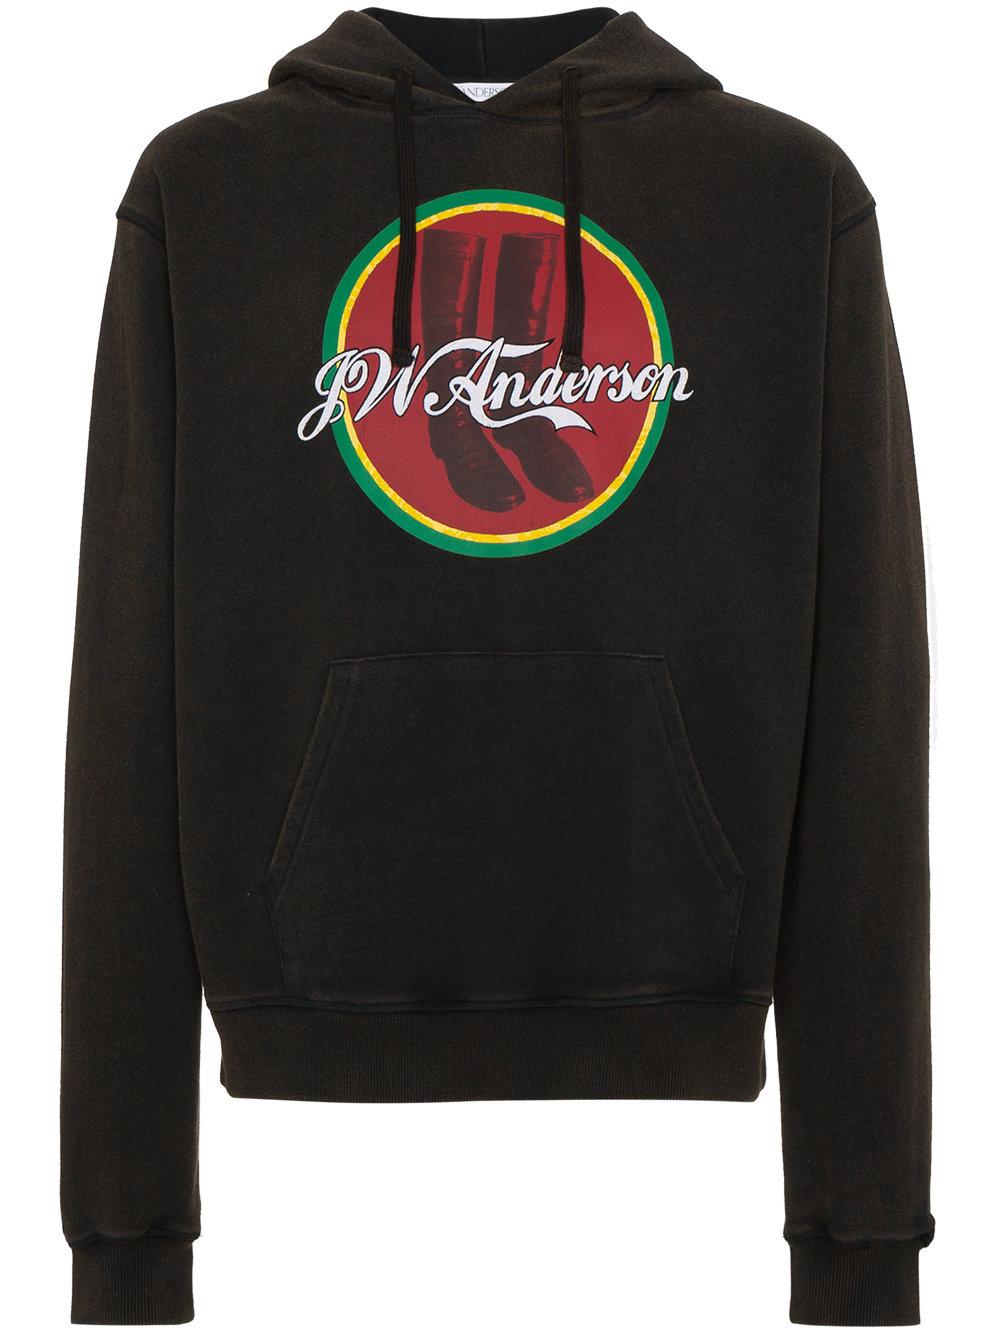 JW Anderson Cola Boots print hoodie $375,  Farfetch.com